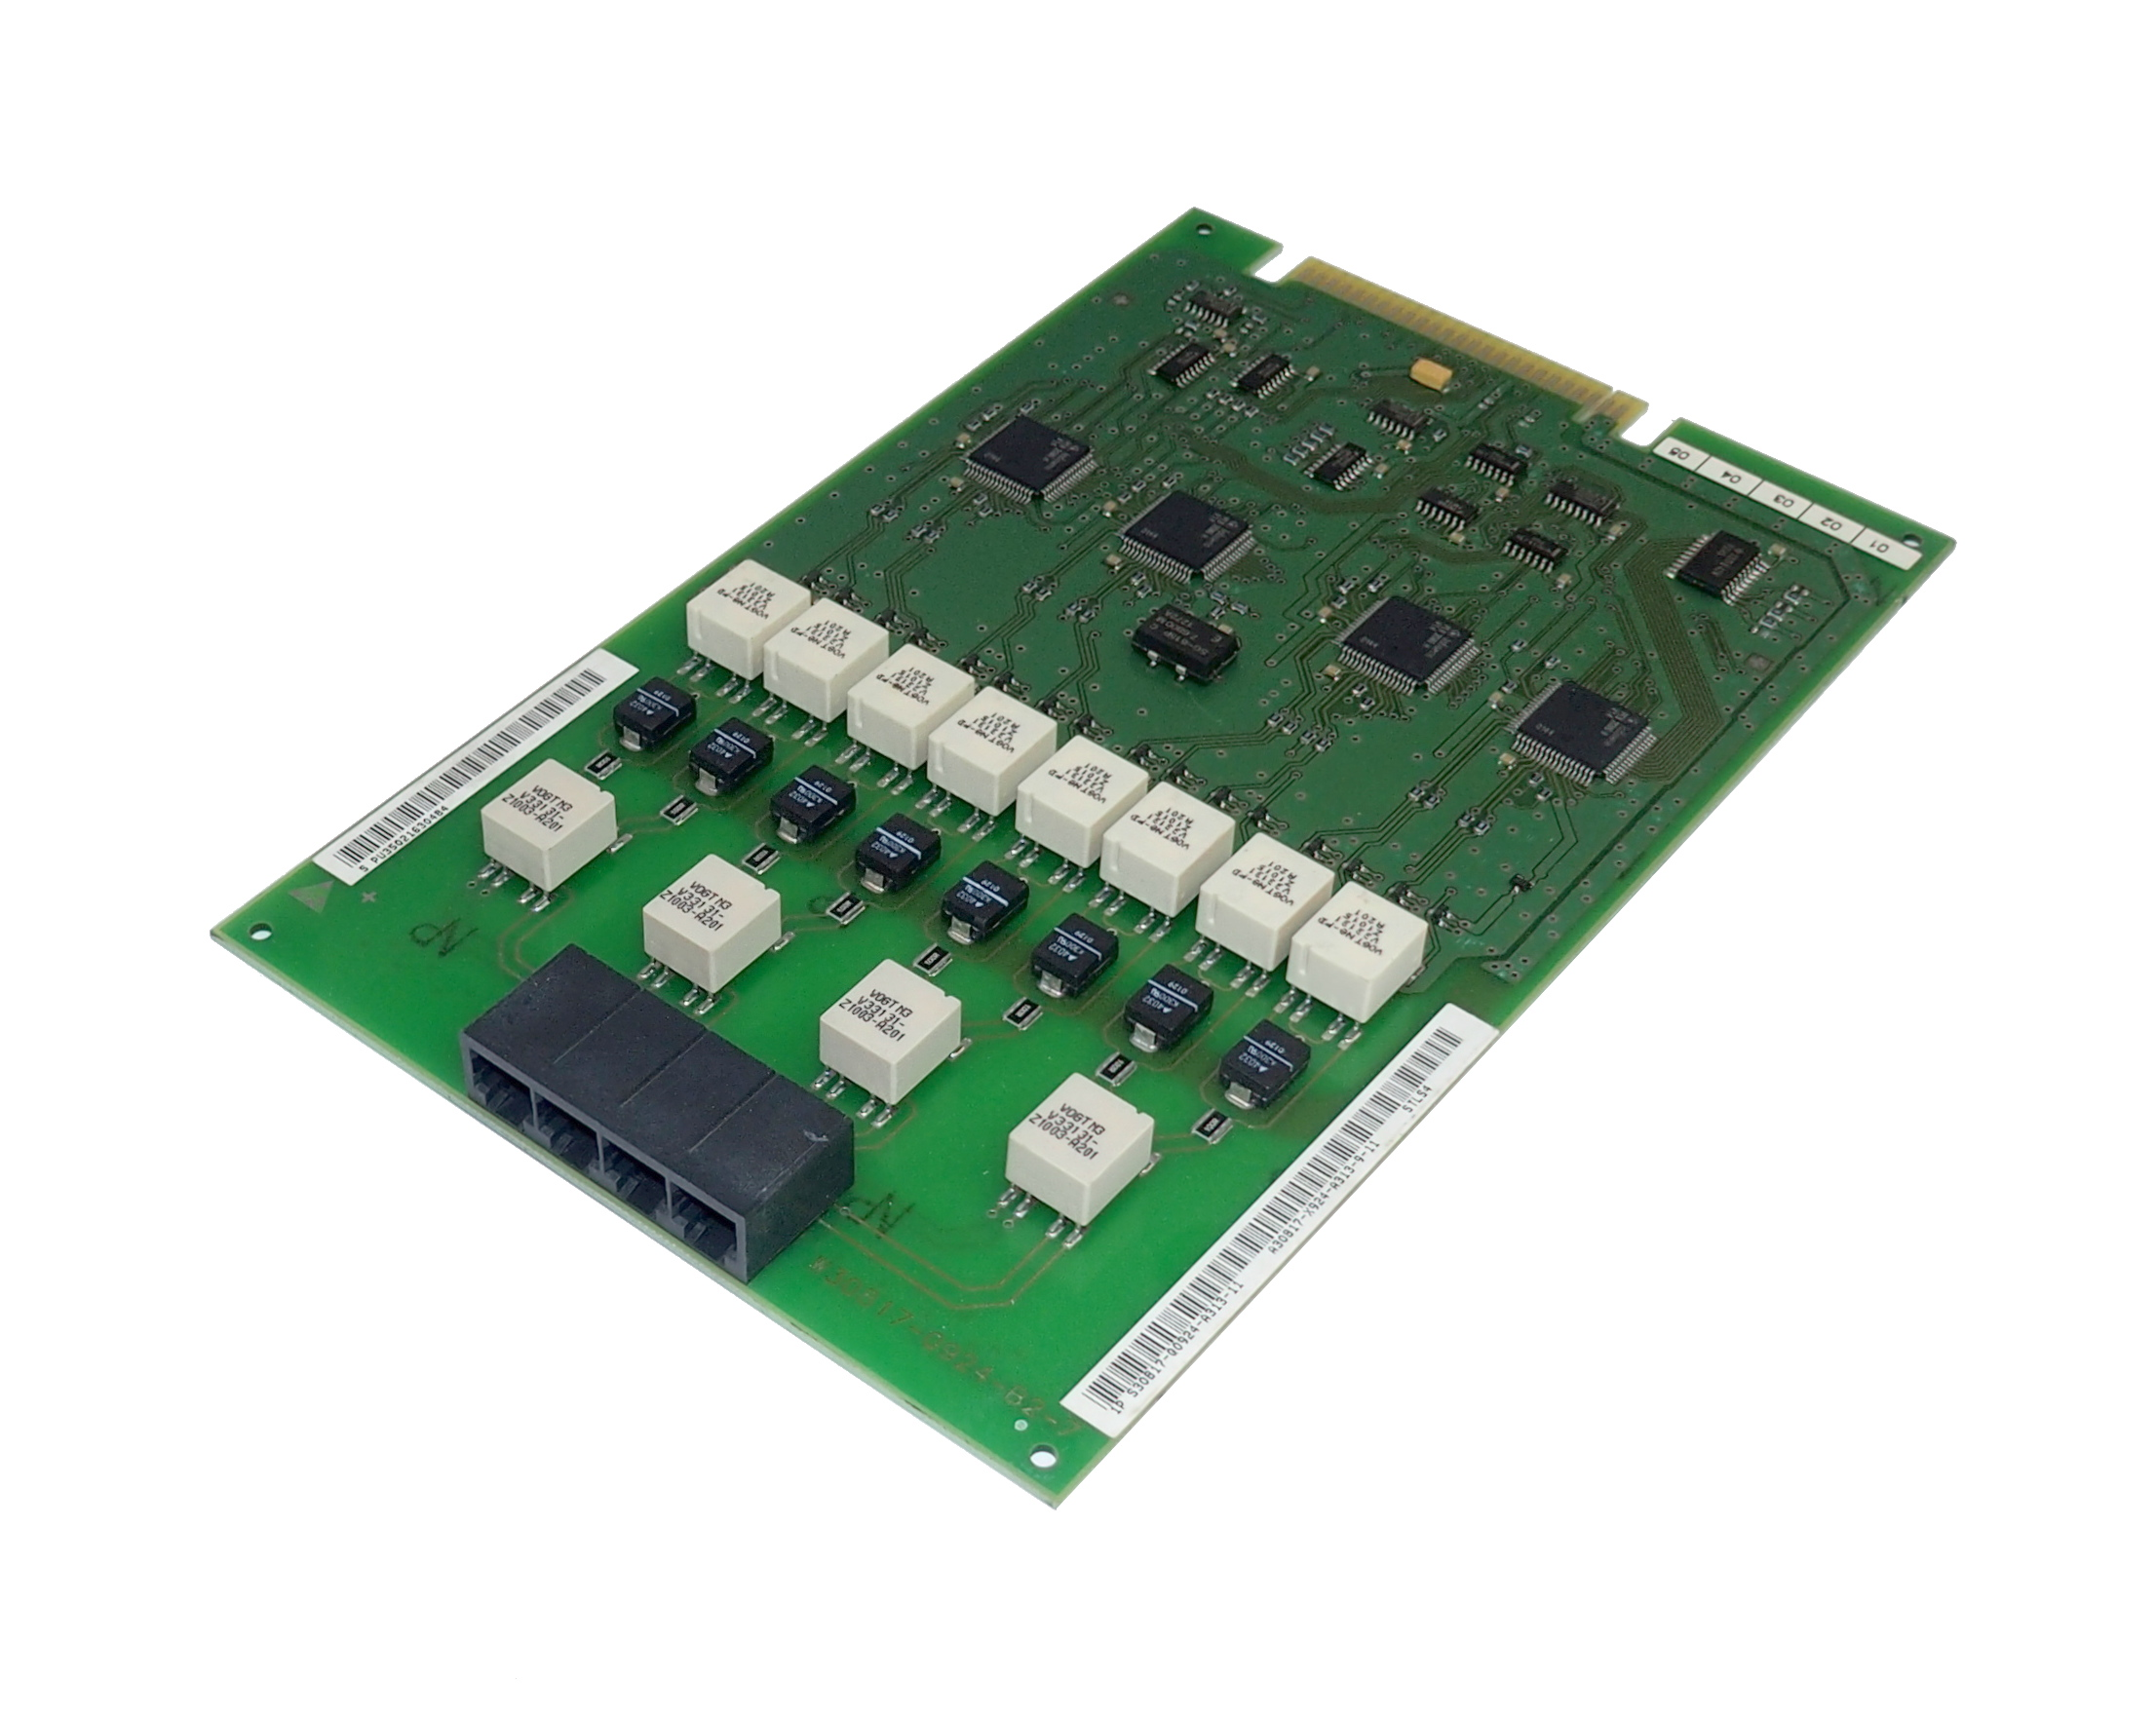 Siemens STLS4 Internal Digital Trunk/ Subscriber Module For HiPath 3500 System